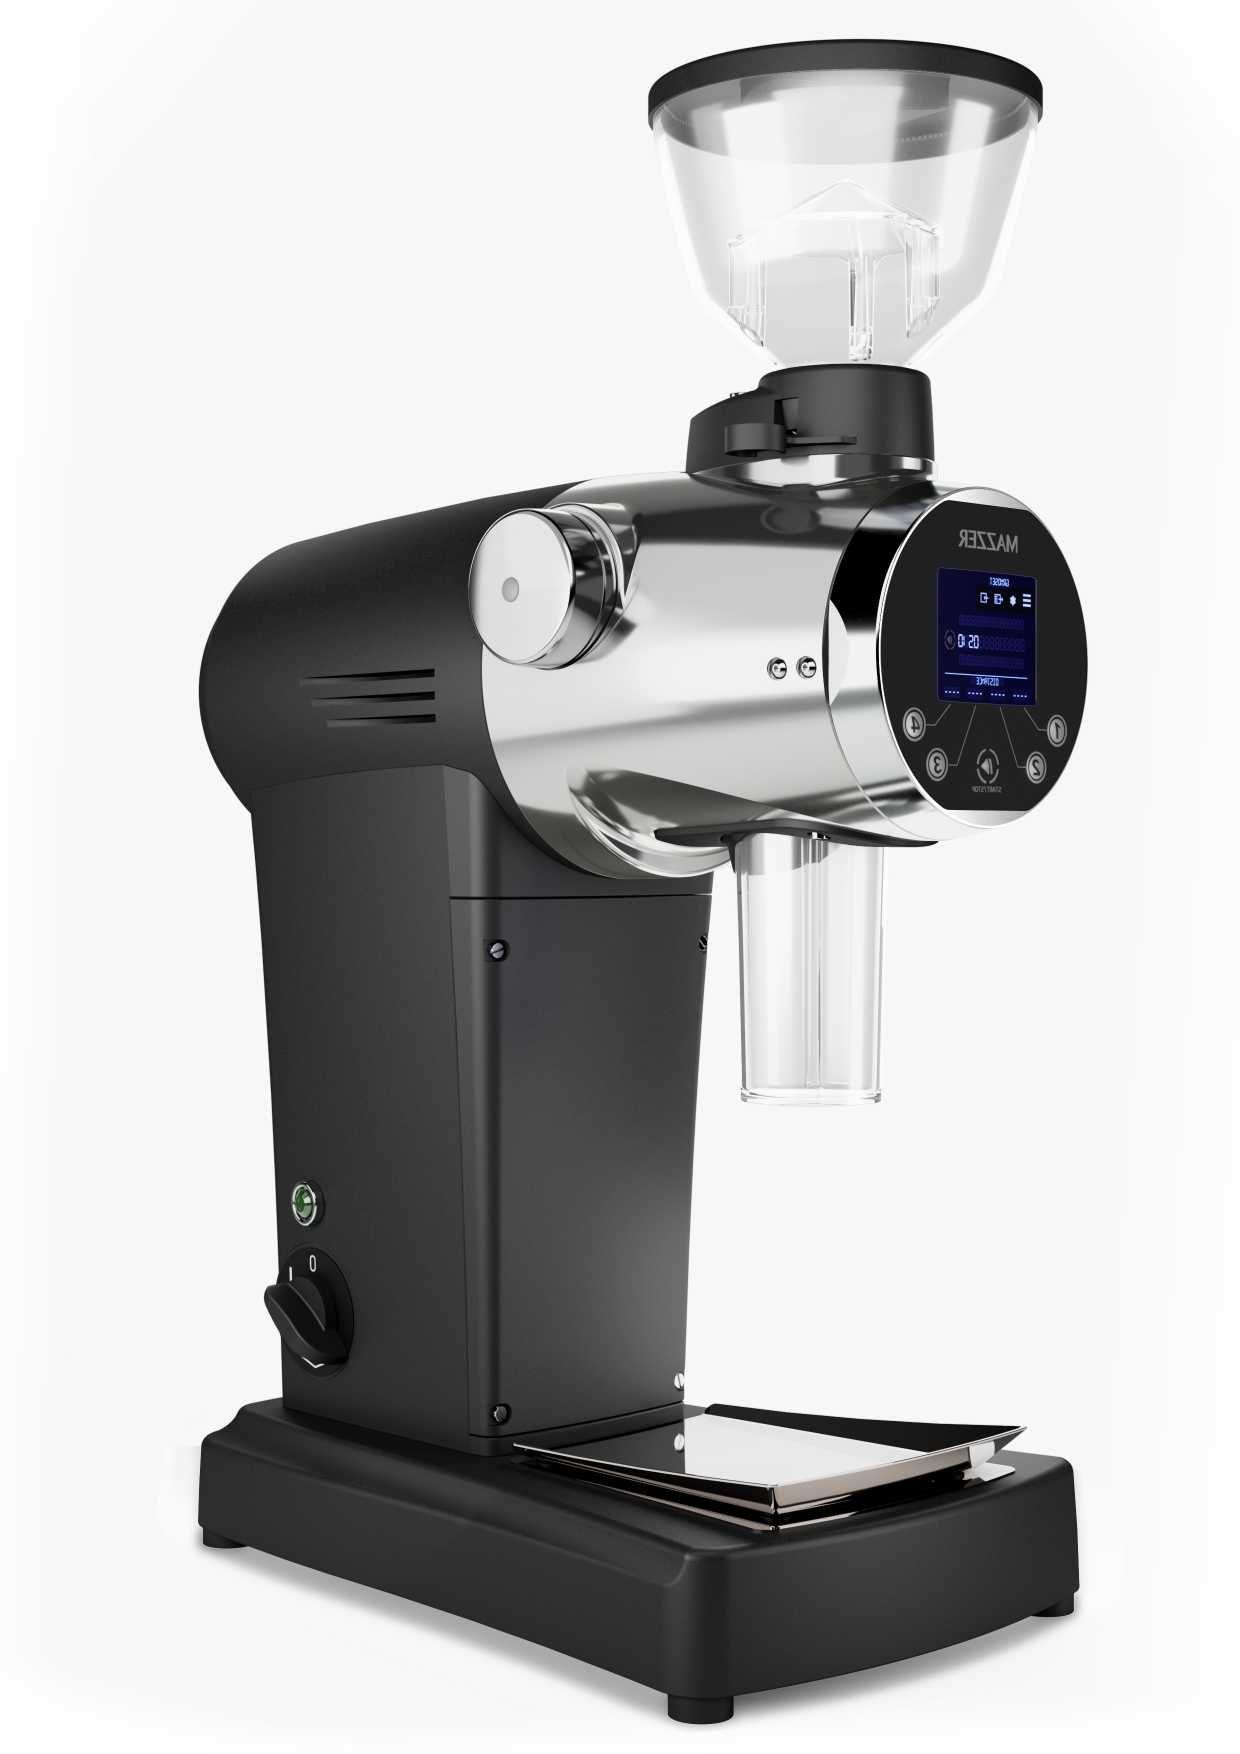 mazzer zm coffee grinder espresso planet canada | Best ...